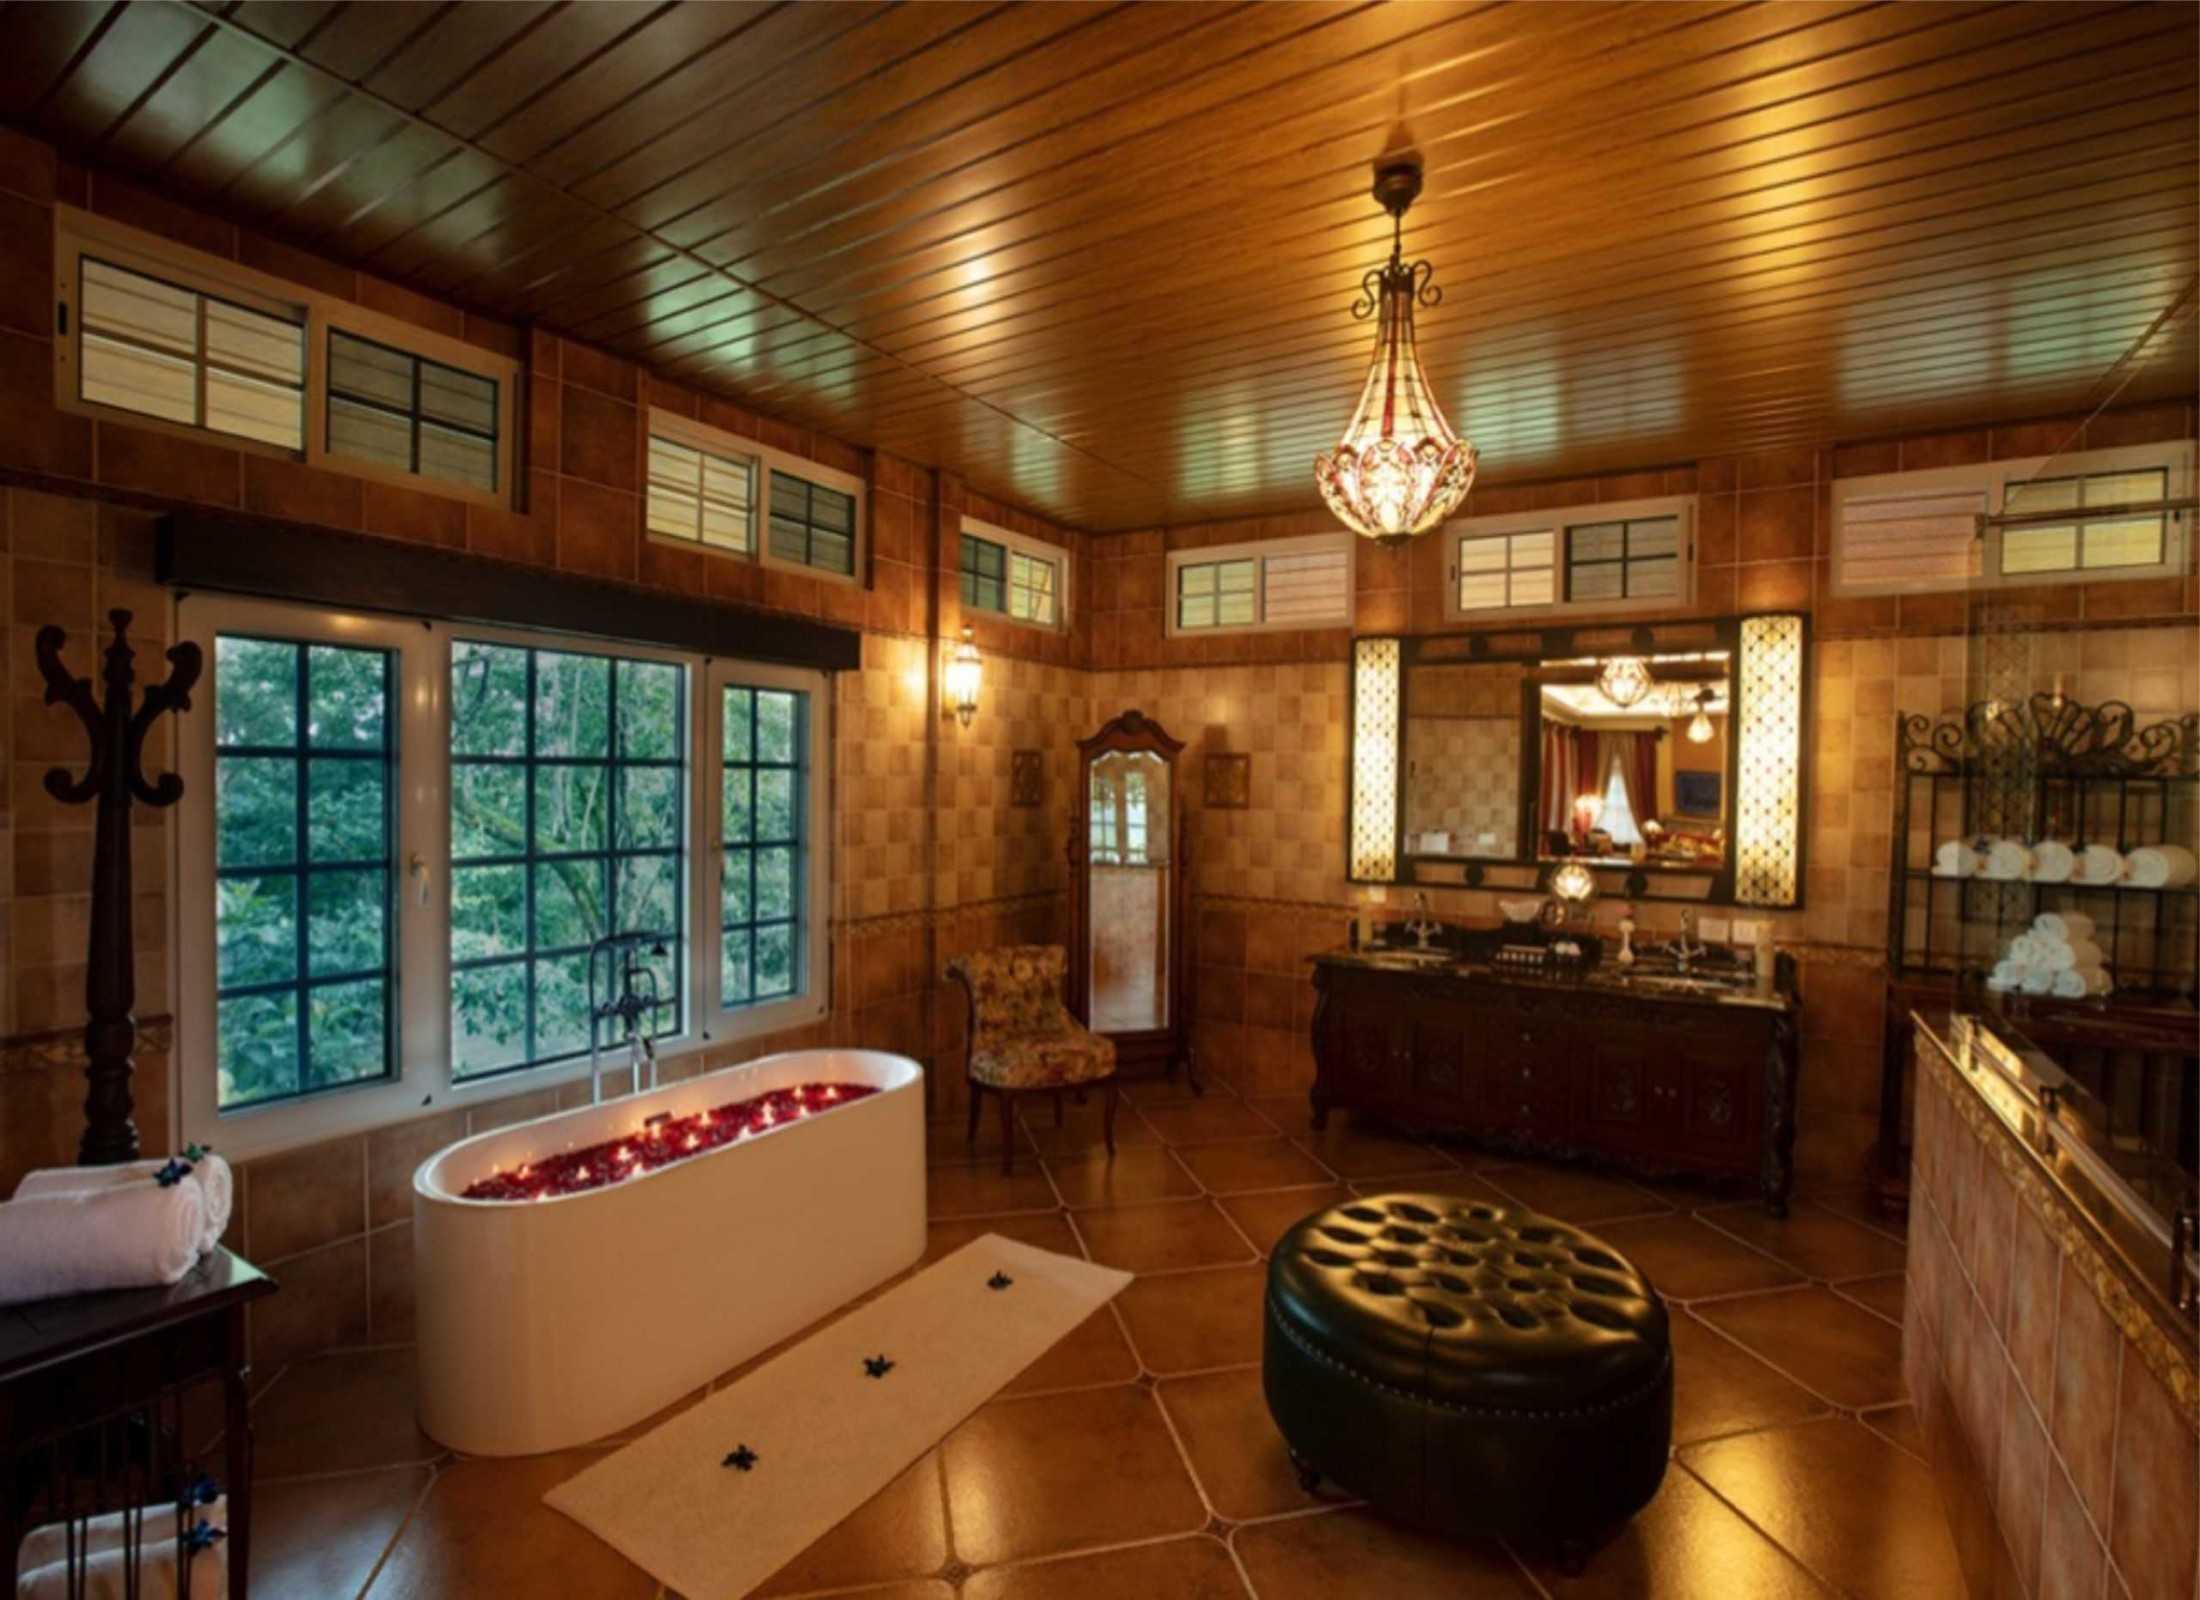 Rekai Design Interior Coorg Wilderness Resort, Coorg-India Virajpet, Main, Mysore - Madikeri Rd, Madikeri, Karnataka 571201, India Virajpet, Main, Mysore - Madikeri Rd, Madikeri, Karnataka 571201, India Rekai-Design-Interior-Coorg-Wilderness-Resort-Coorg-India  113298